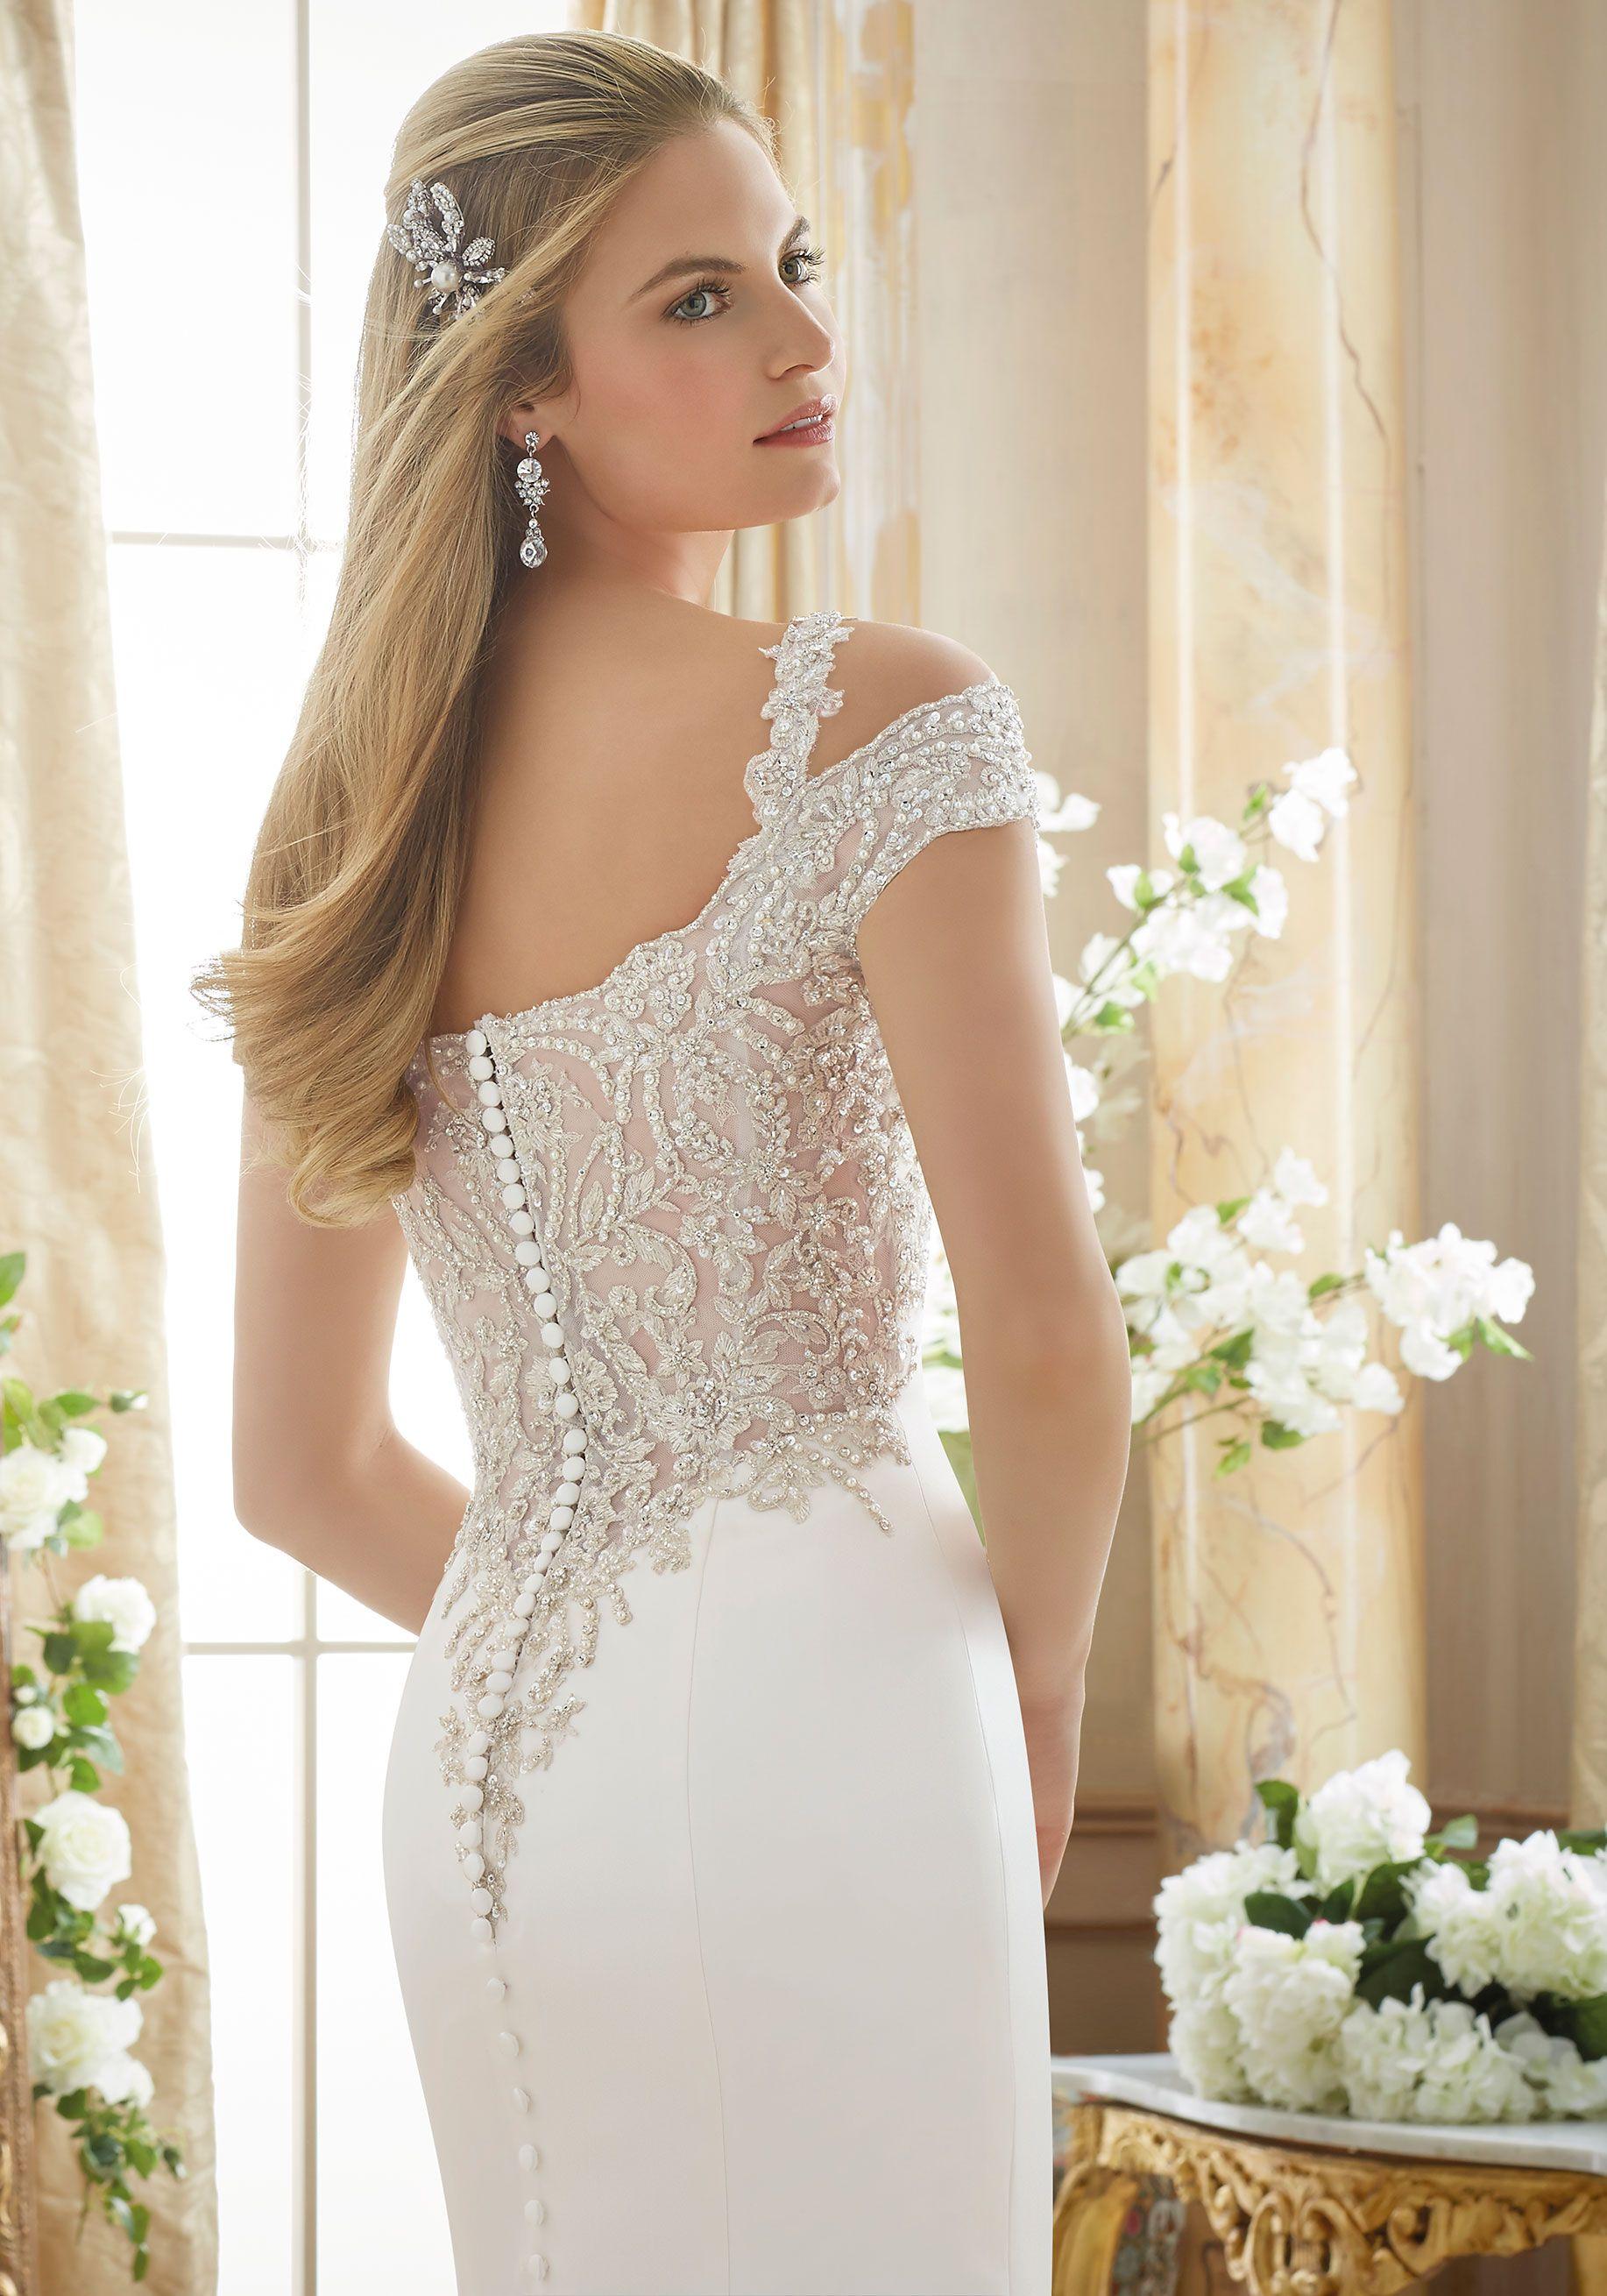 f688f0d0be7 Mori Lee - 2880 Perfect Wedding Dress